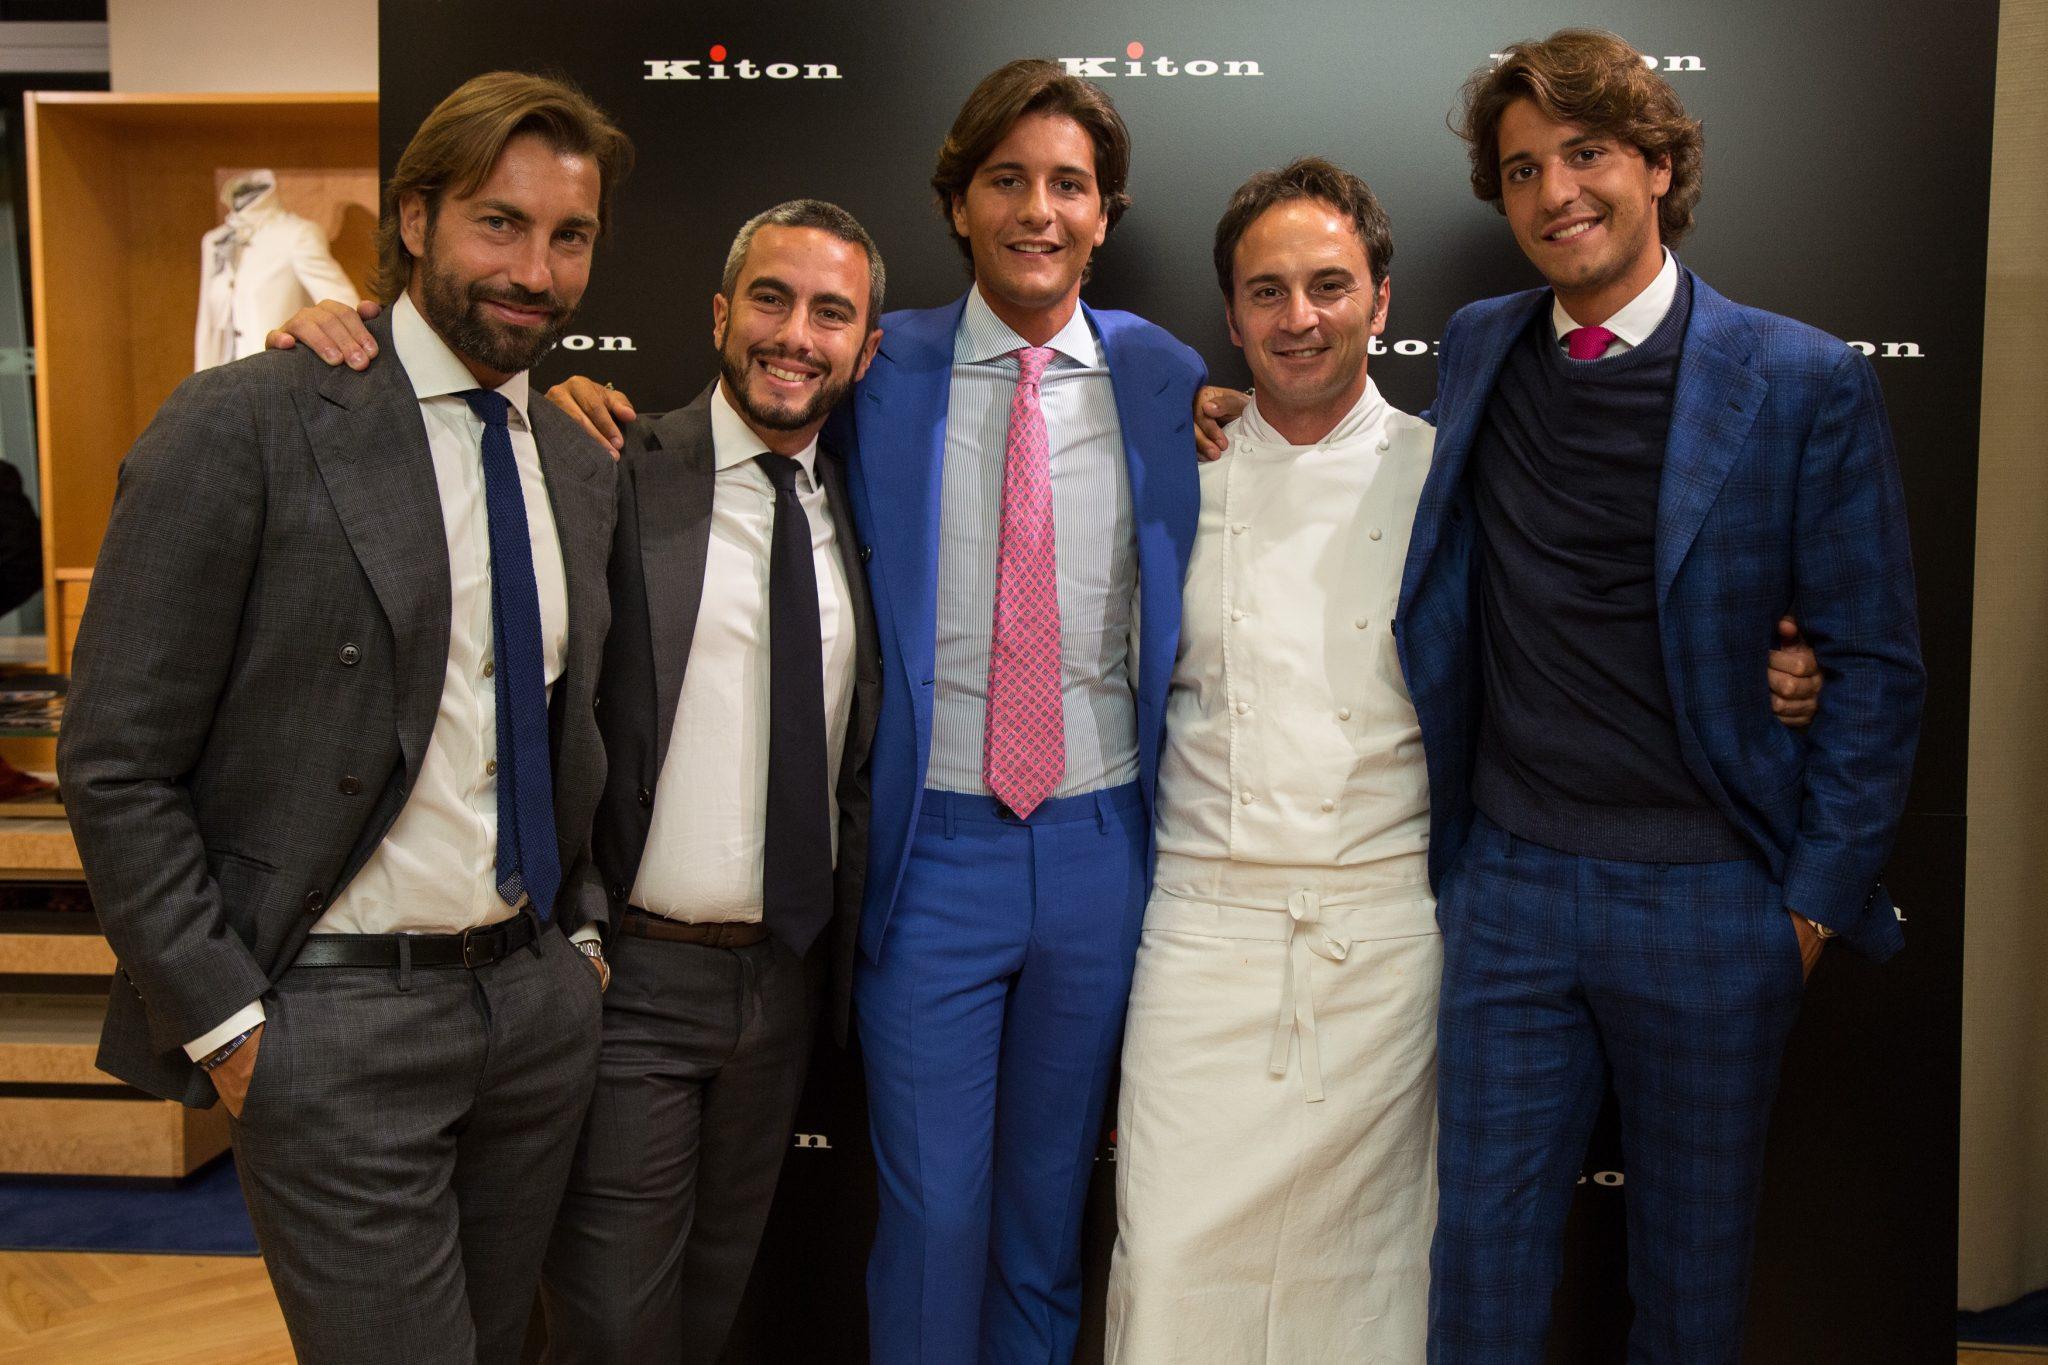 Family-Paone-Nino-Di-Costanzo